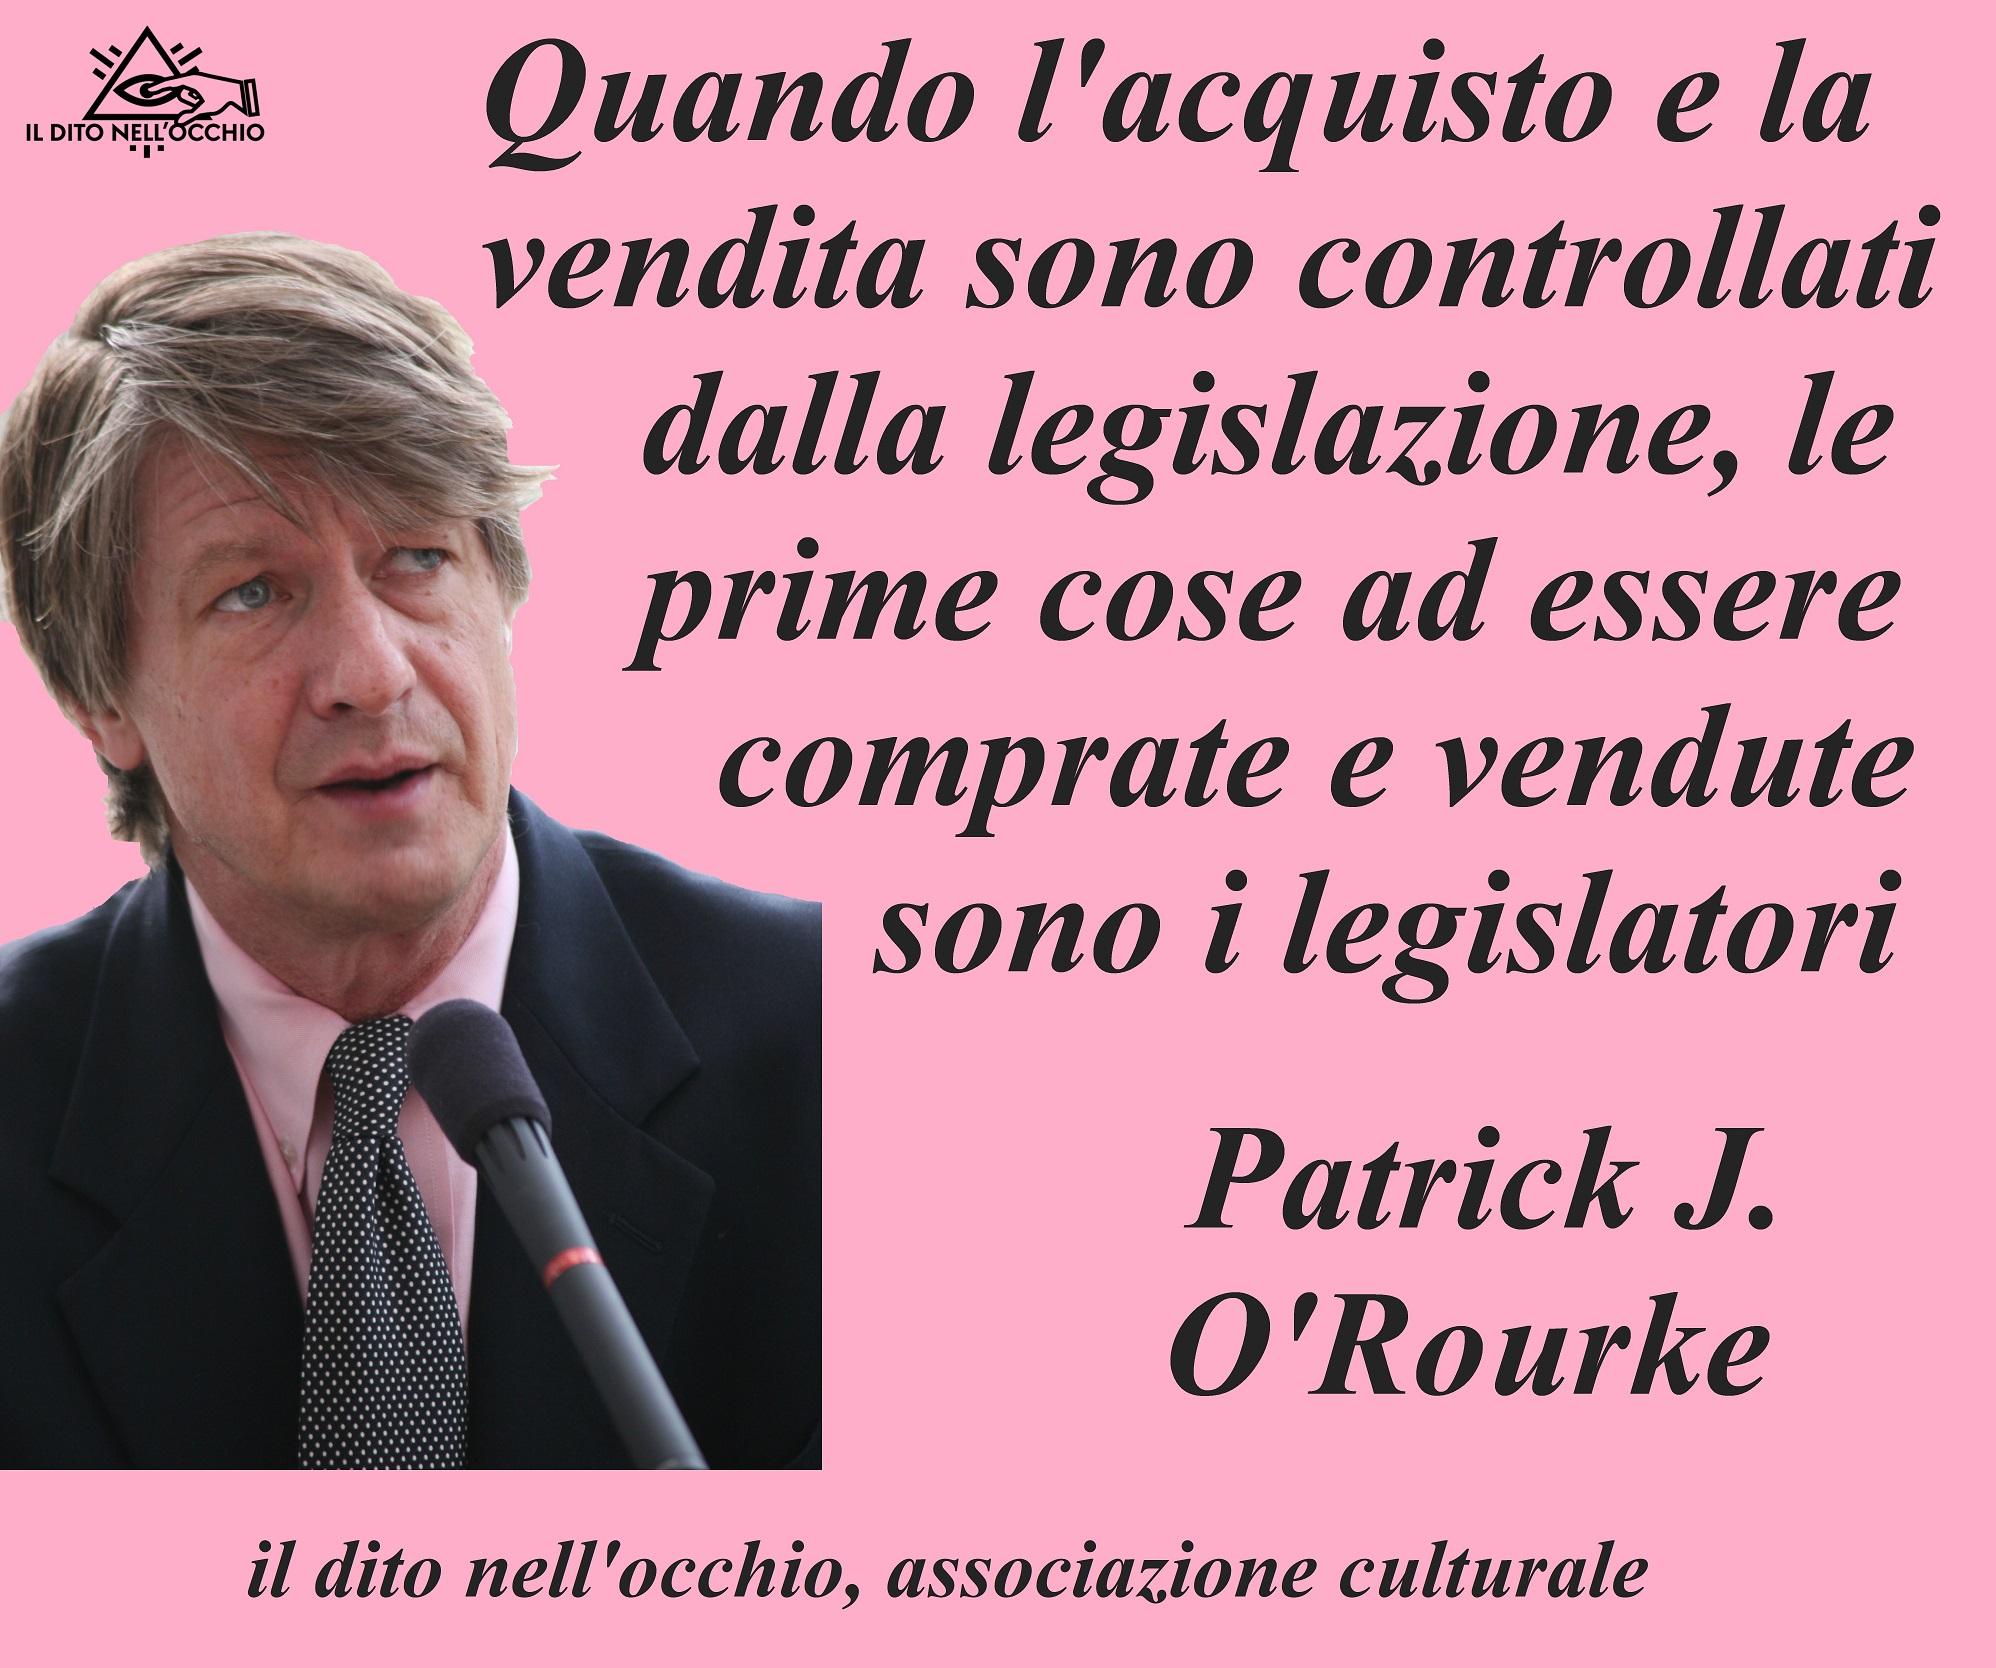 Patrick J. O'Rourke